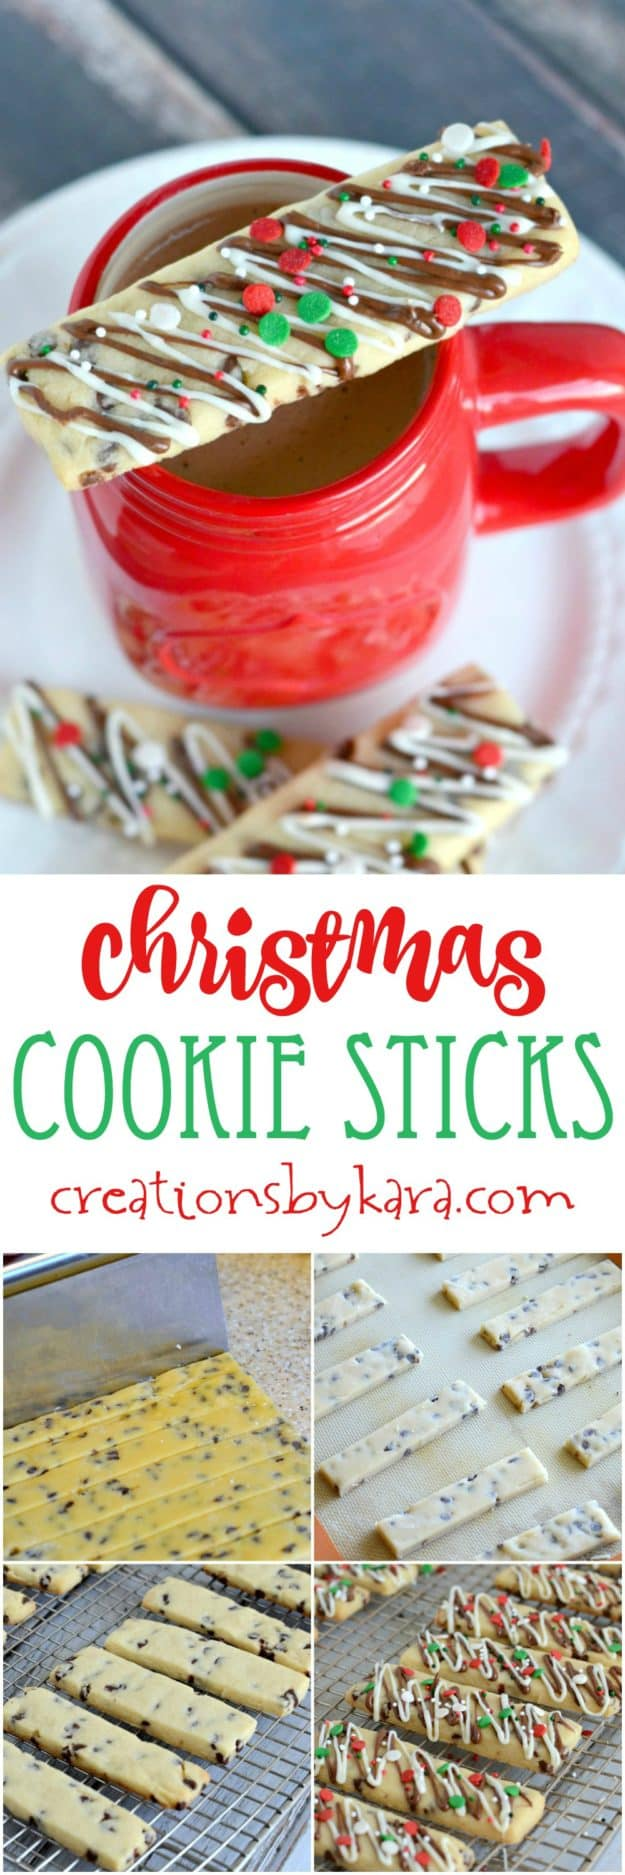 Christmas Cookie Sticks recipe collage